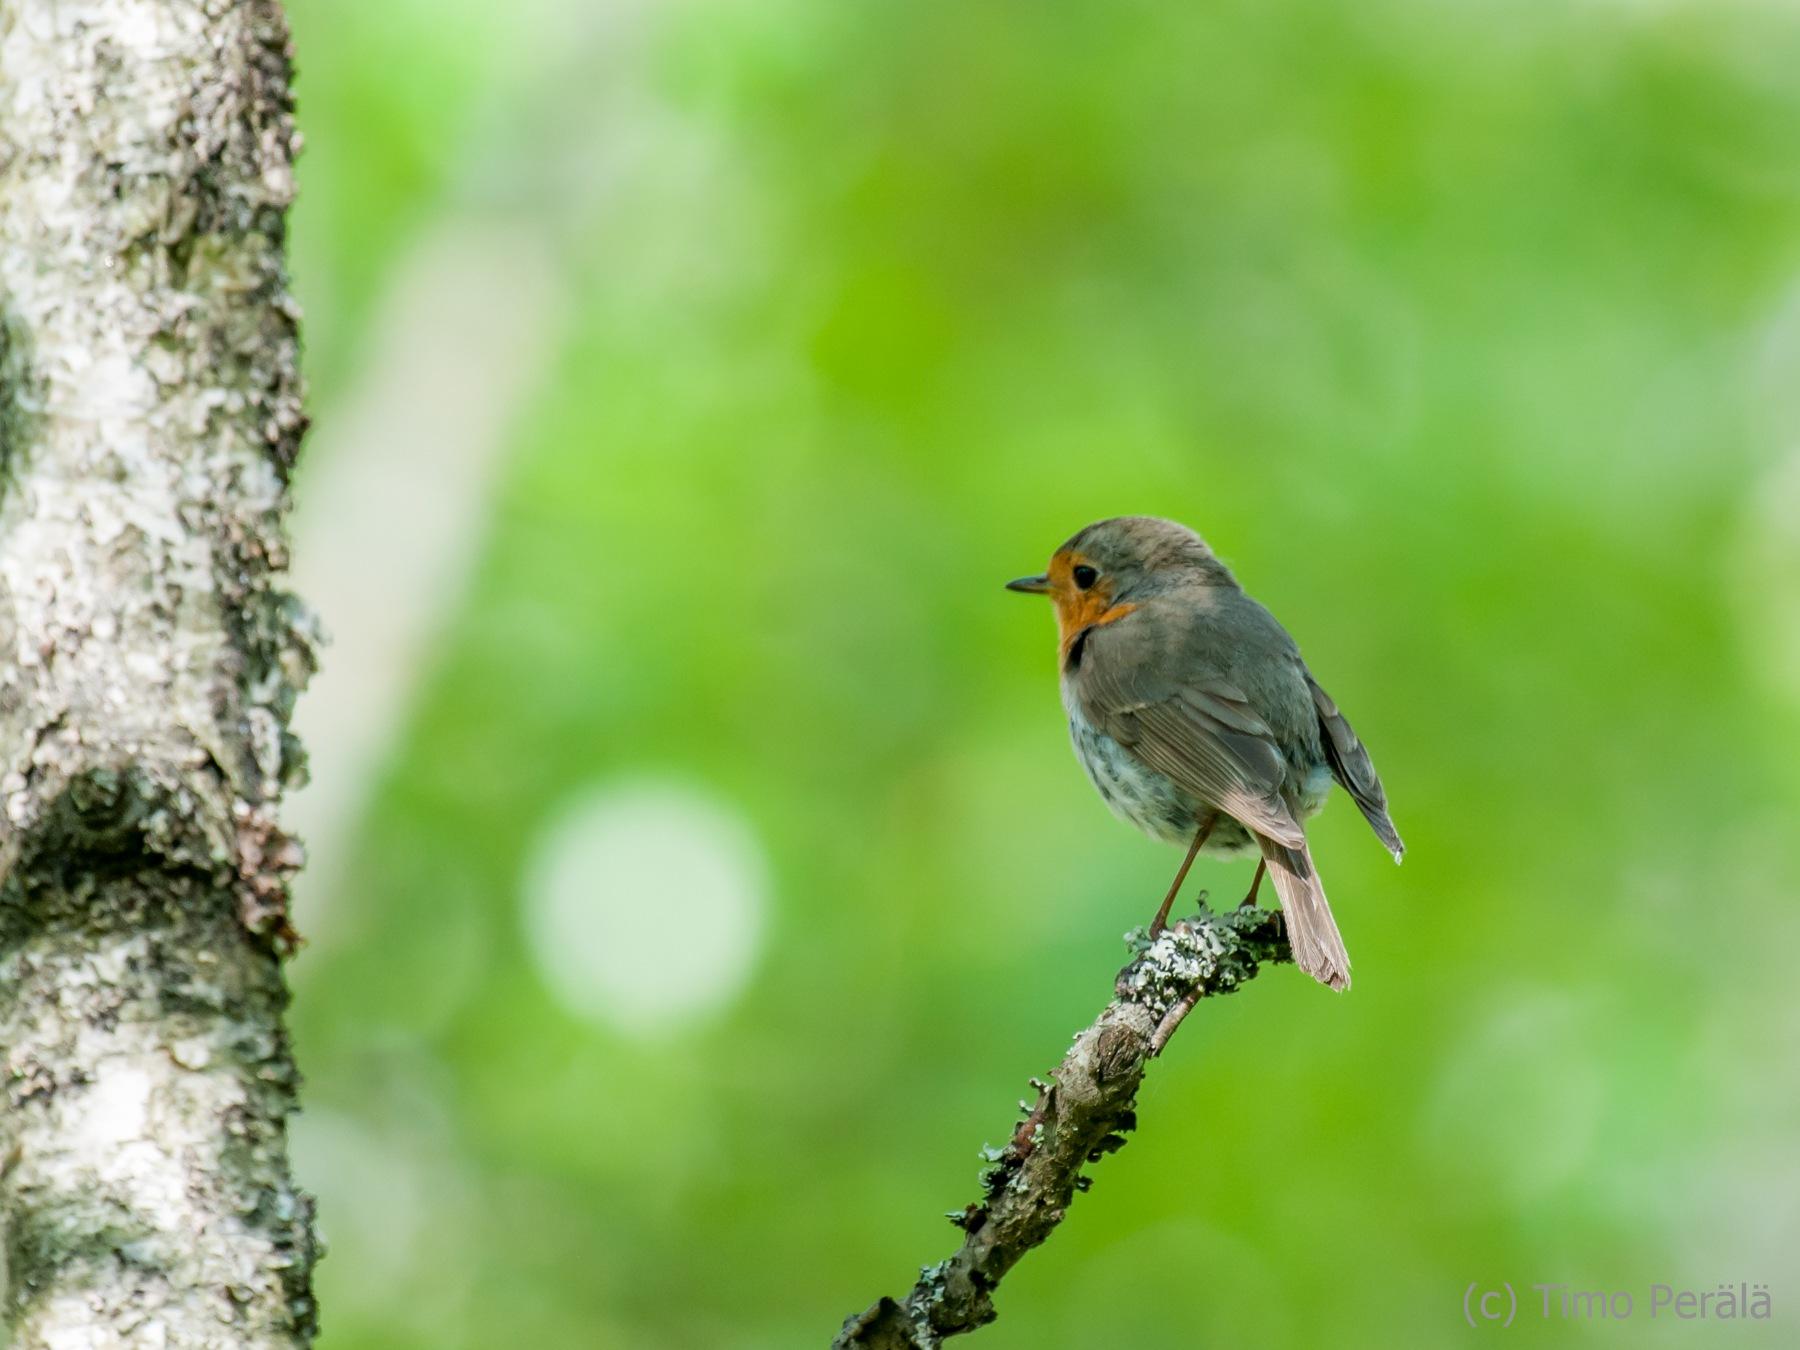 Small bird by Timo Perala